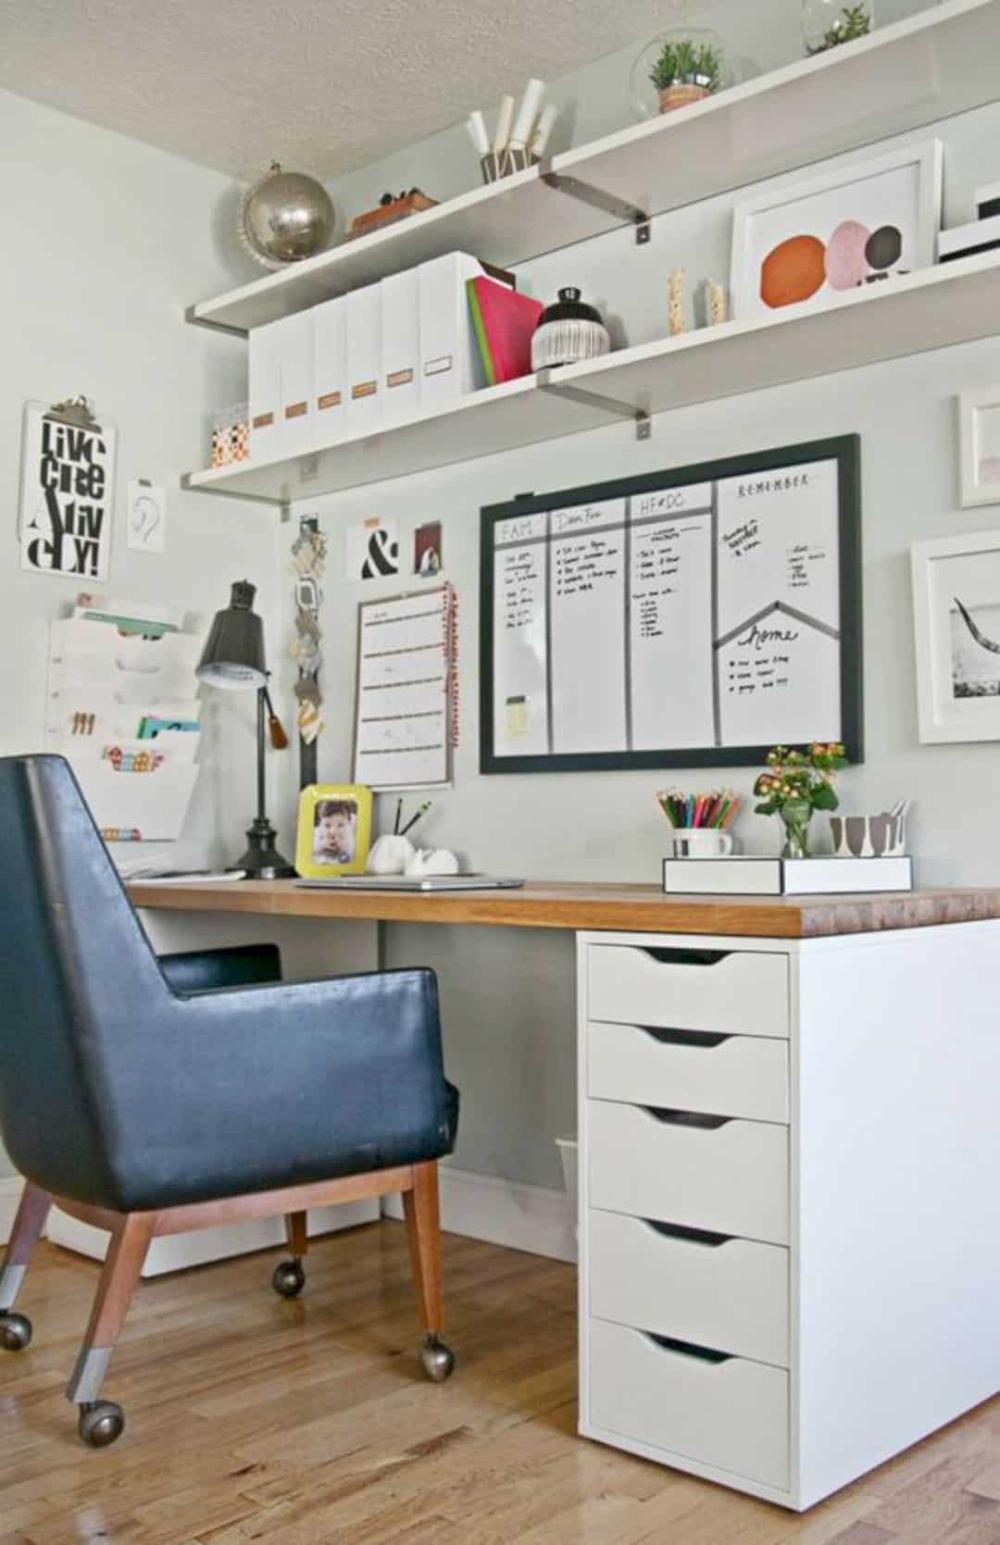 21 Modern Home Office Furniture Ideas In 2020 Ikea Home Office Home Office Storage Office Desk Designs